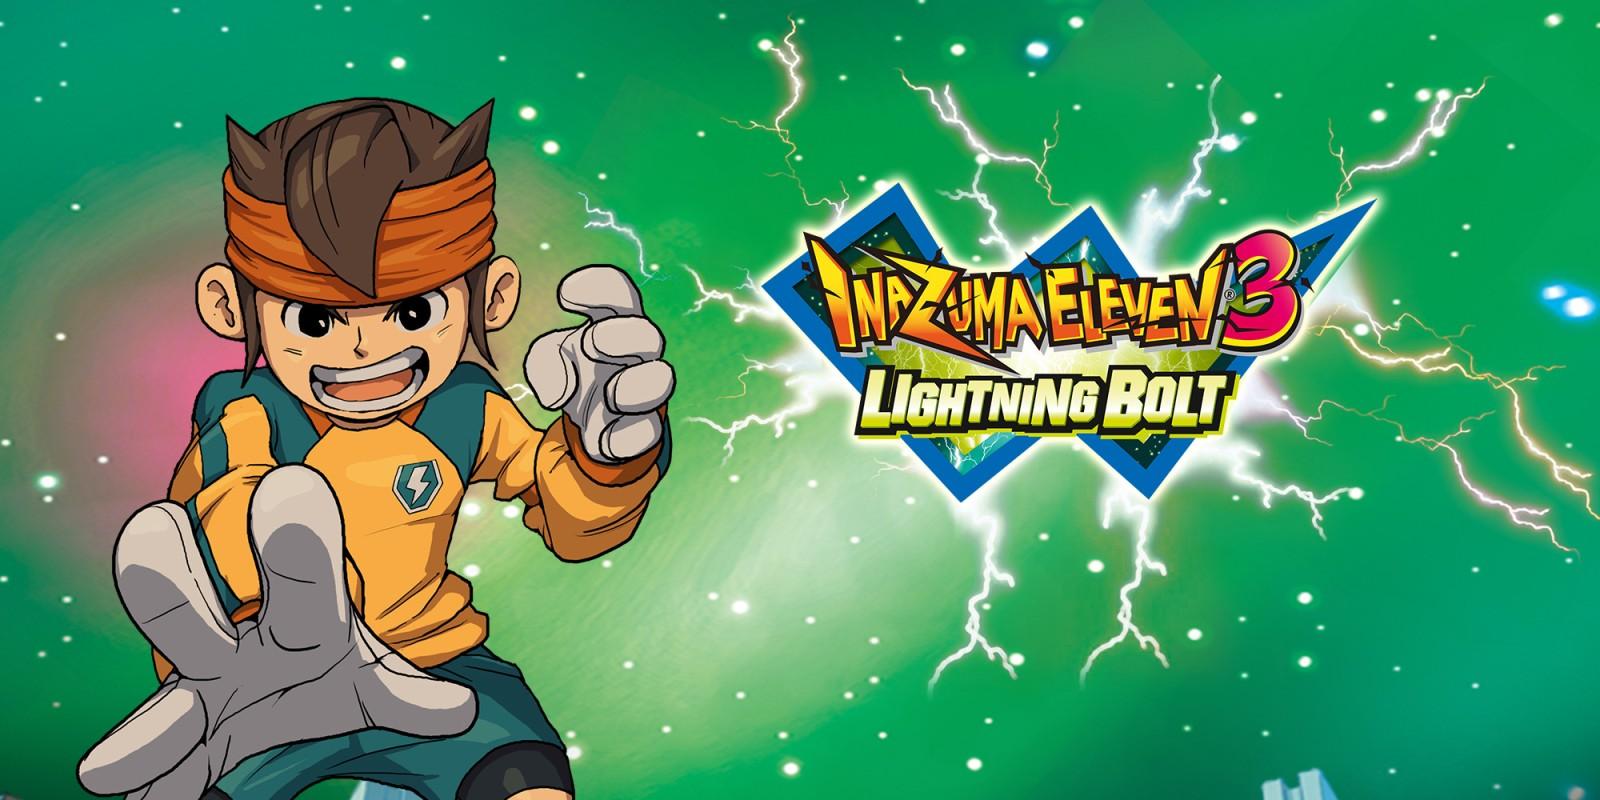 inazuma eleven 3 nds torrent download